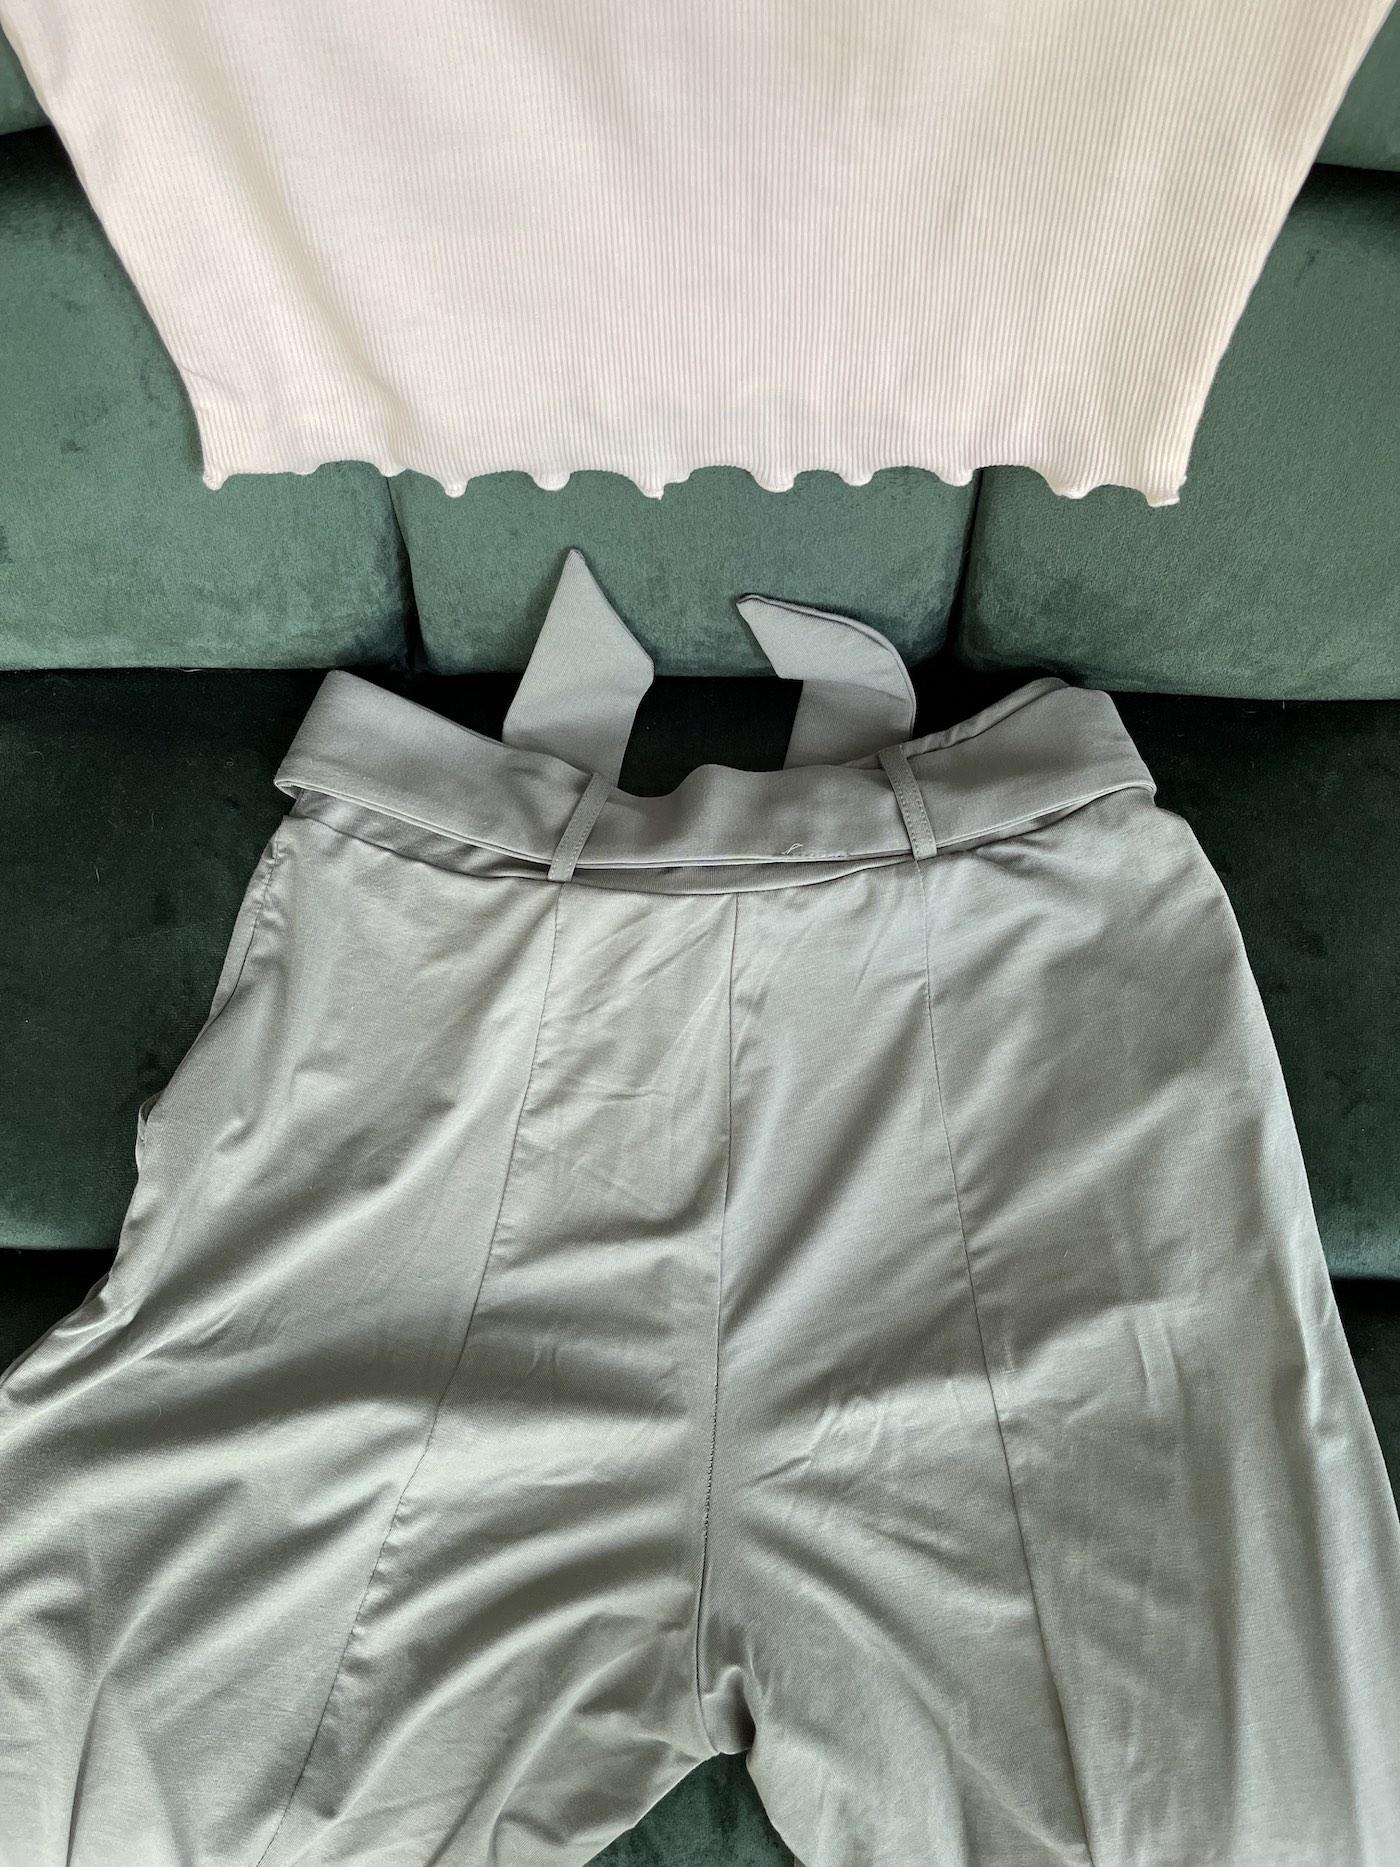 The Jade Pants Les Lunes Erfahrungen rückansicht Po Nähte und Taillengürtel (April Top Kombination)